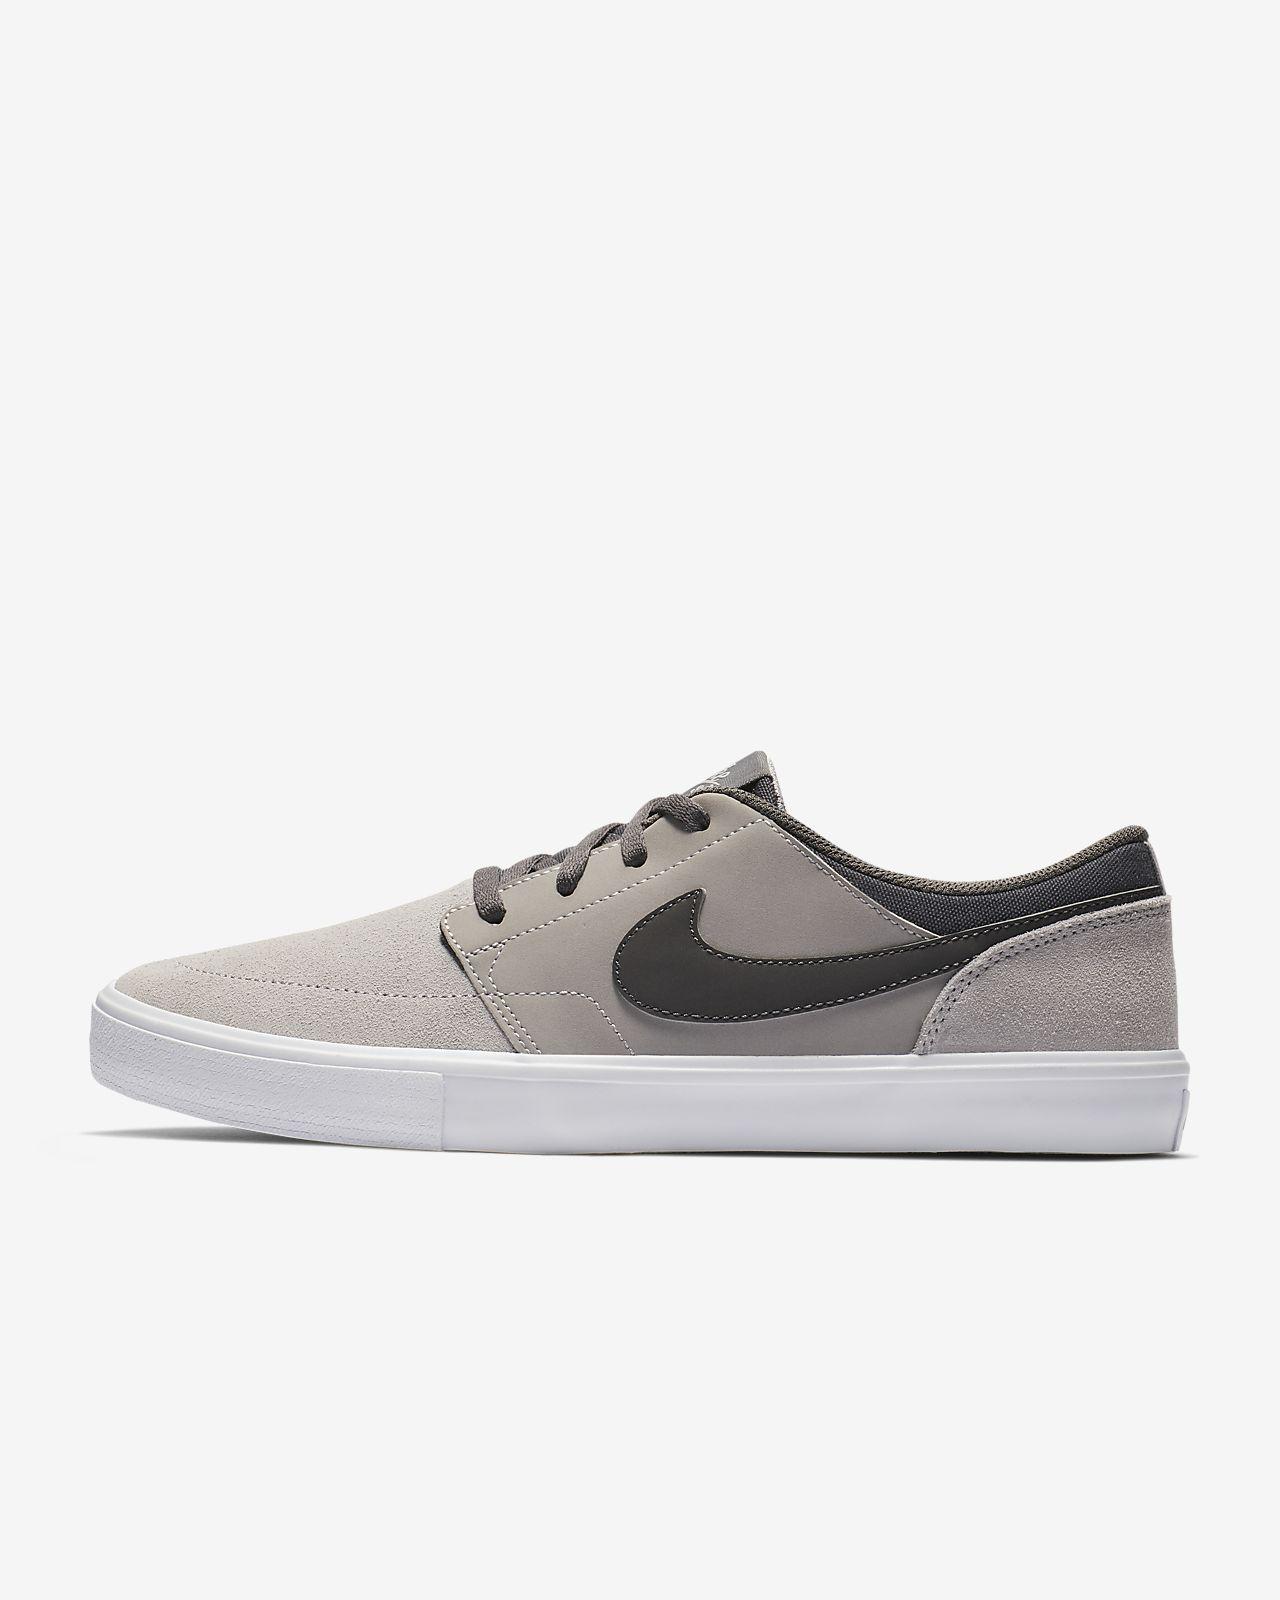 Portmore Solarsoft De Pour Nike Ii Chaussure Sb Homme Skateboard xX4Iwz 657434e0eb1